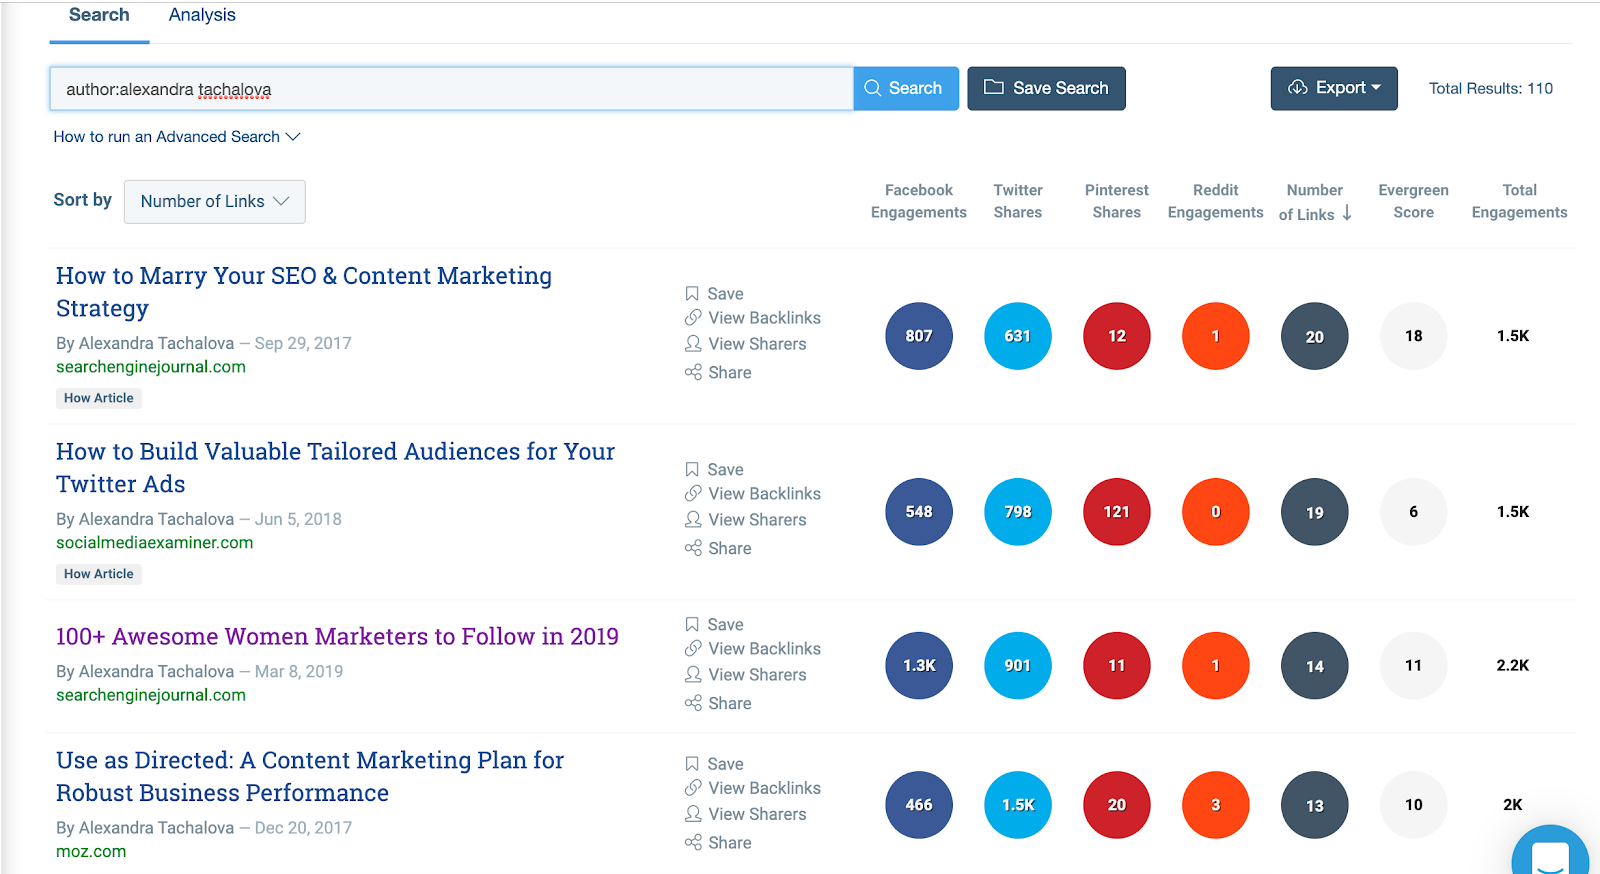 link guadagnati ai post sui principali siti di marketing digitale.